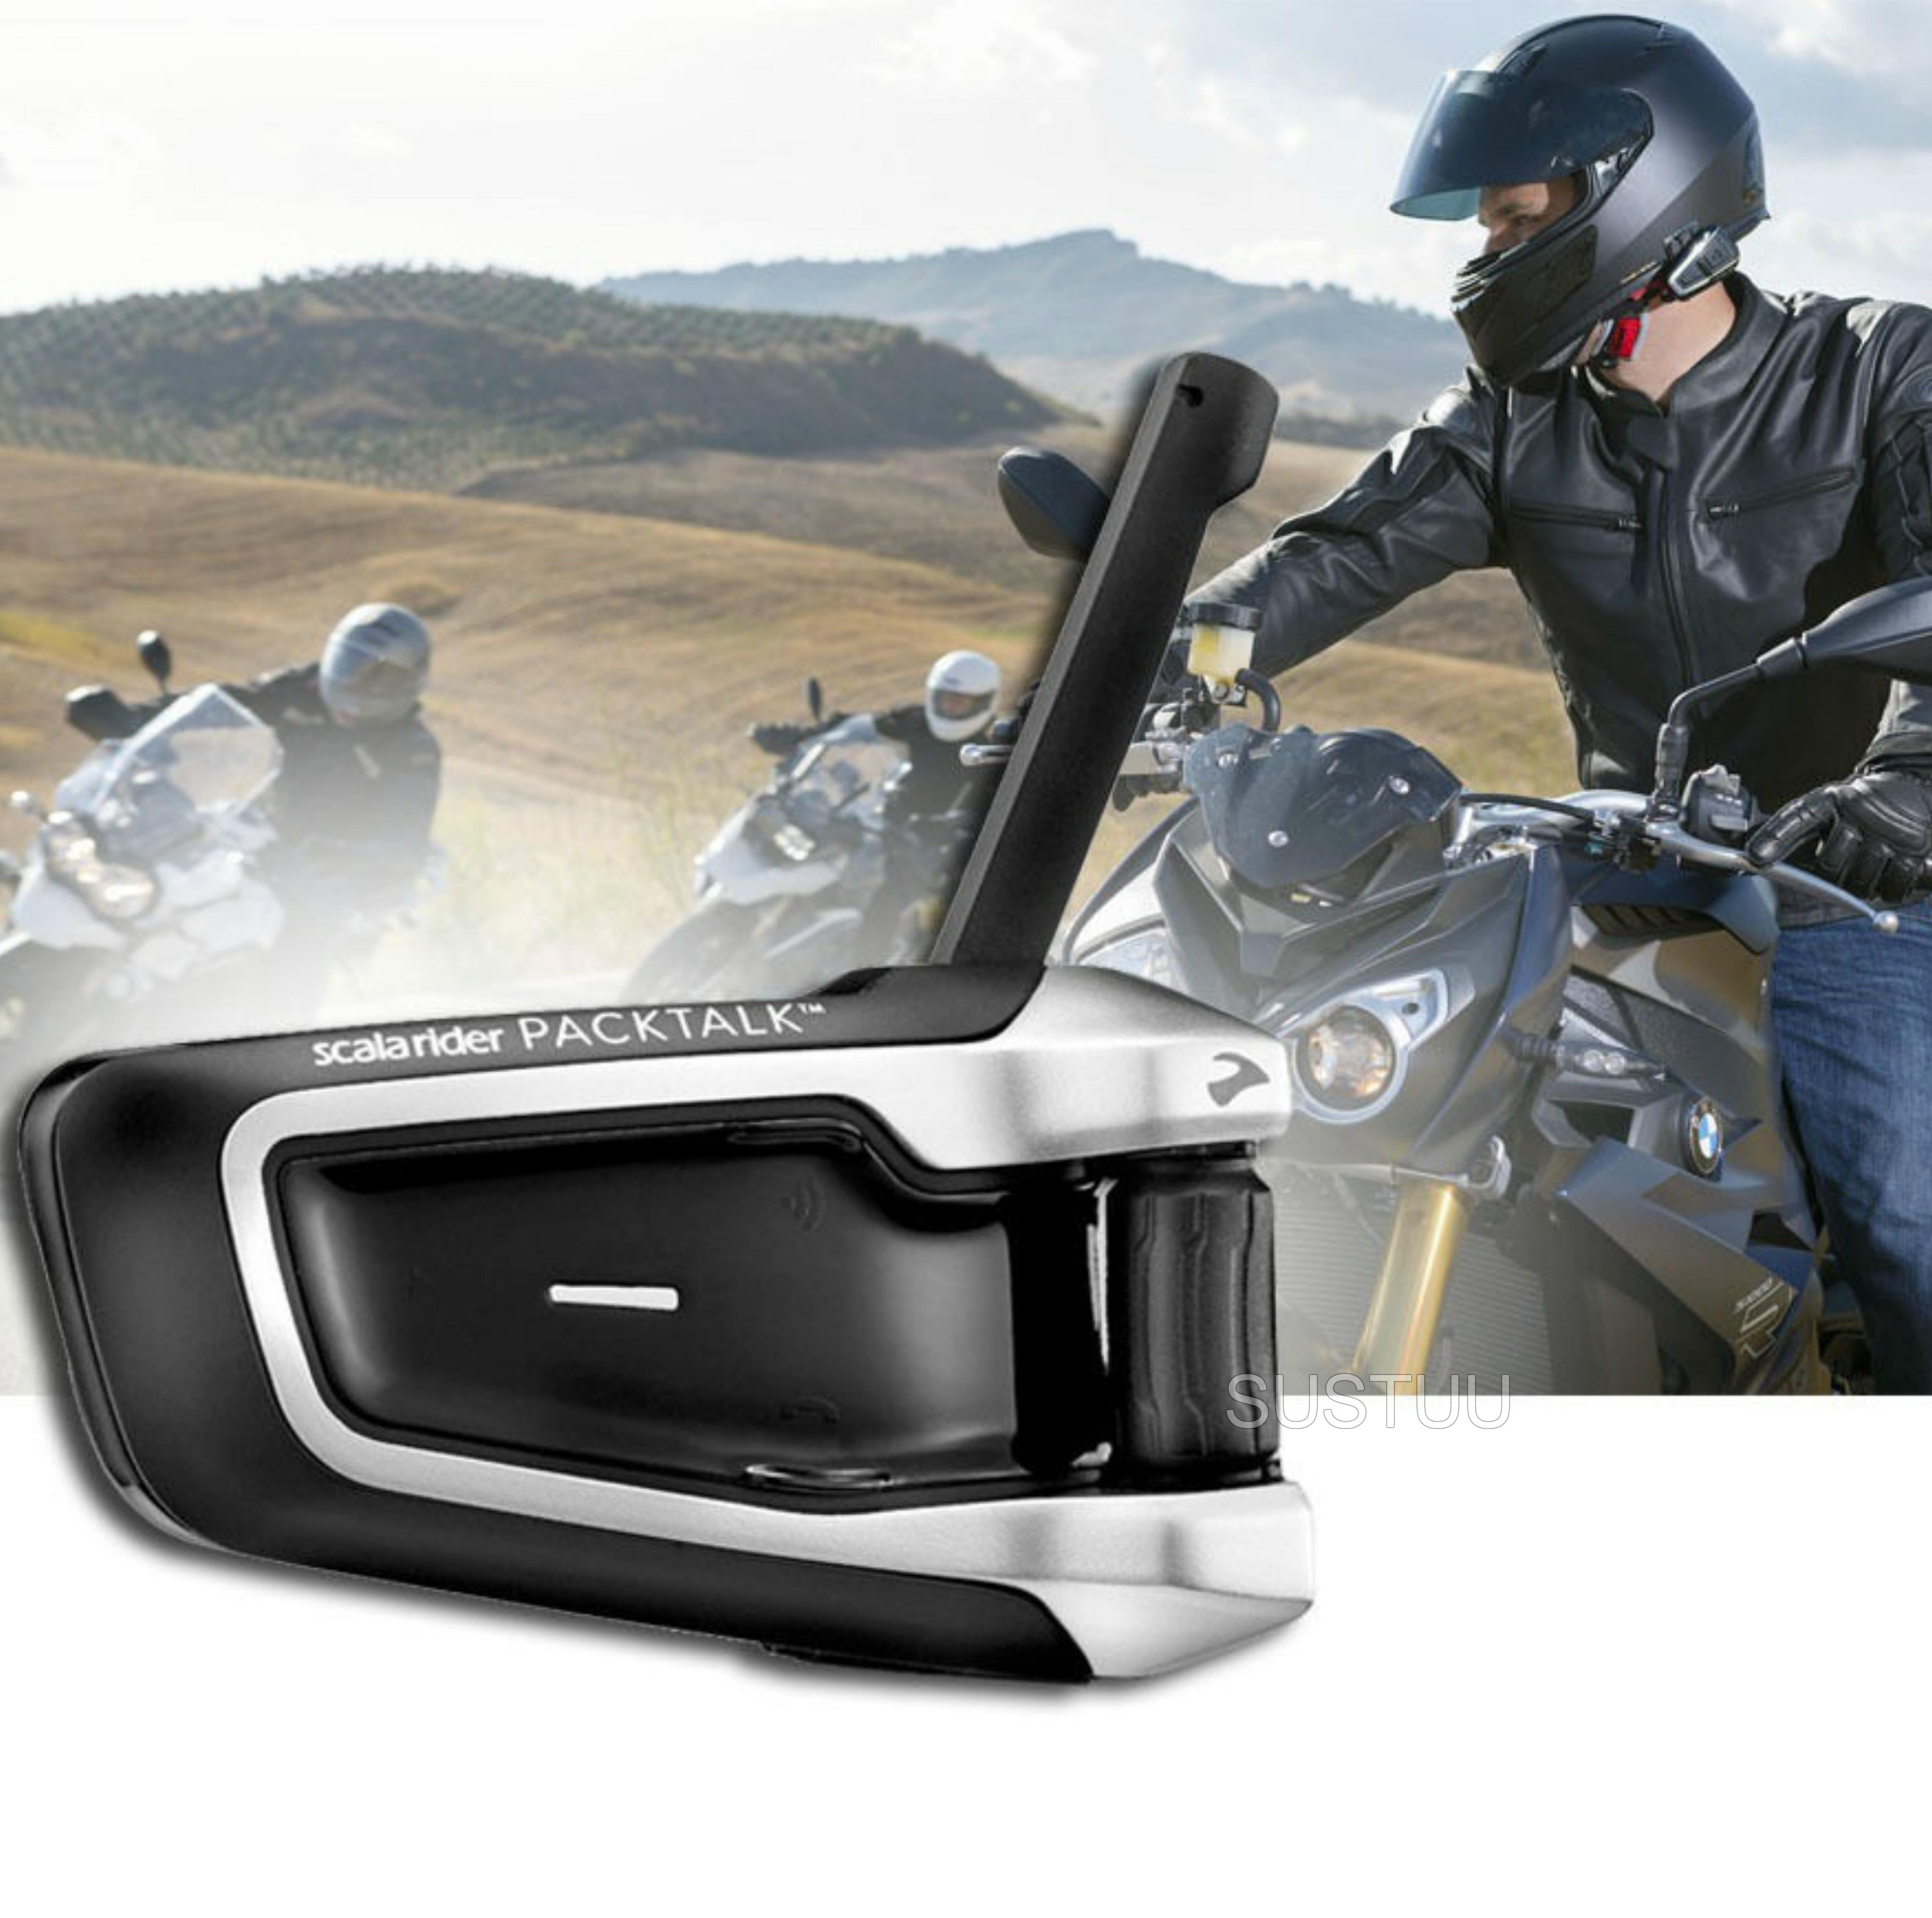 Cardo Scala Rider Packtalk Solo | Motorcycle / Bike Bluetooth Helmet Intercom System